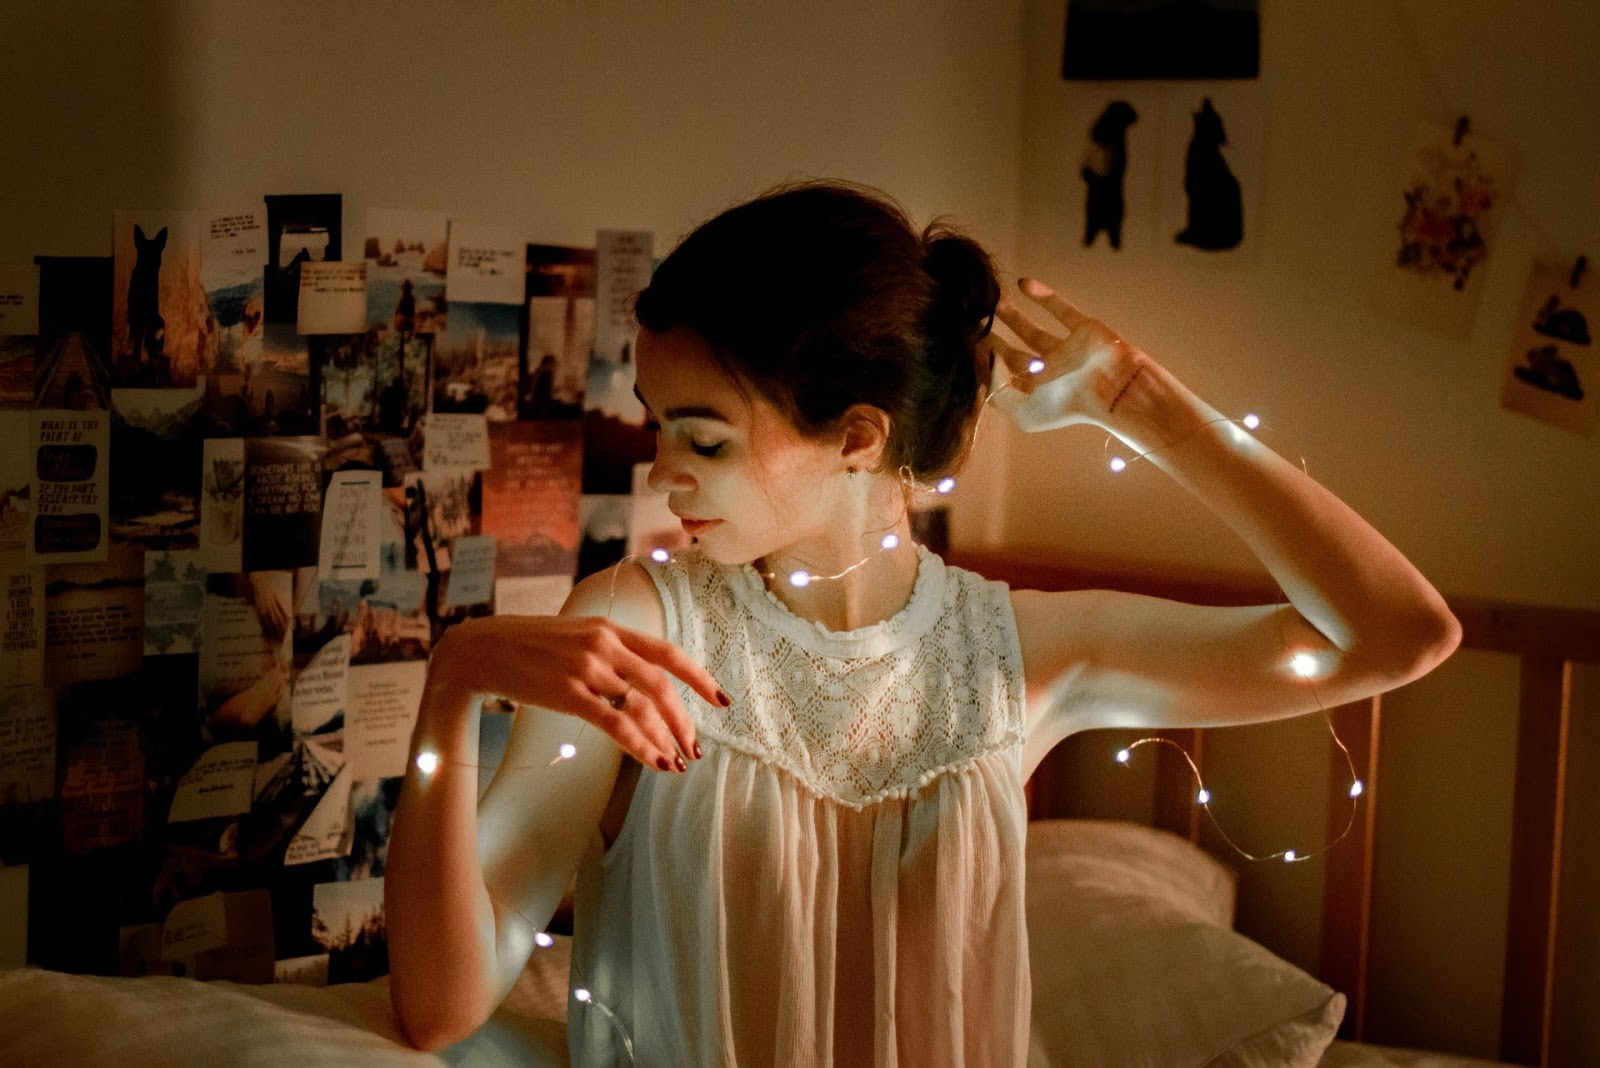 Girl draping string lights around herself.